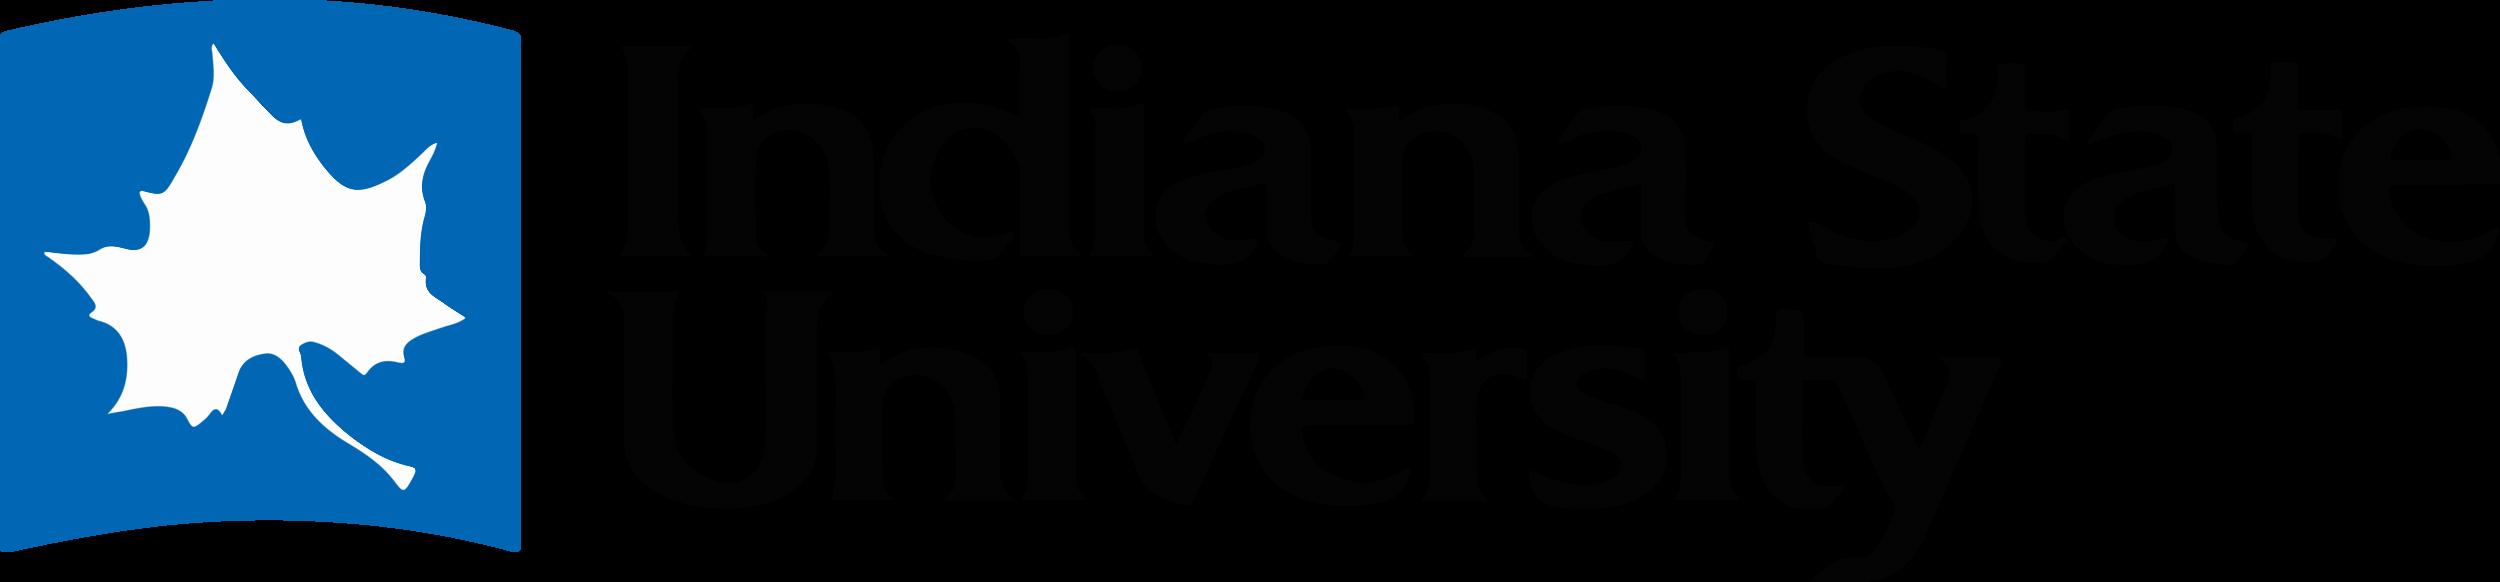 [Logo] Indiana State University.png